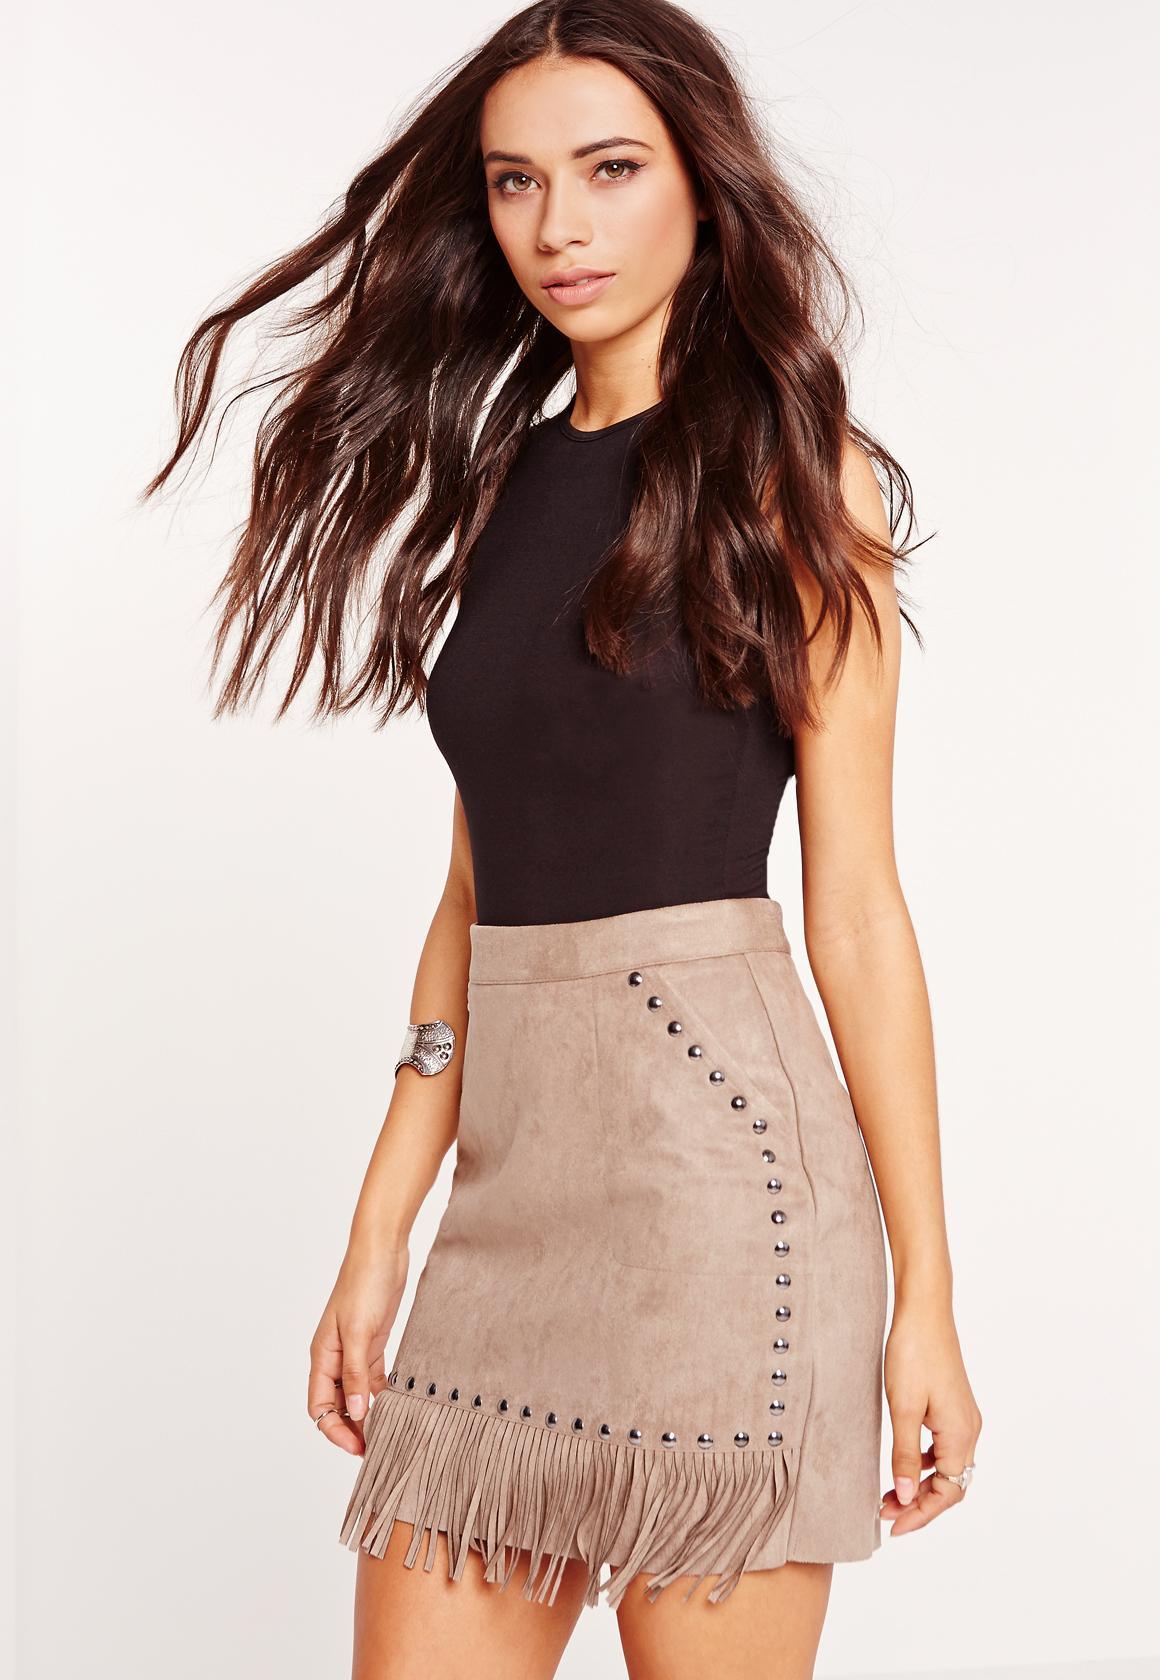 057278c690 Fringe Stud Detail Faux Suede Mini Skirt Grey | Missguided Ireland